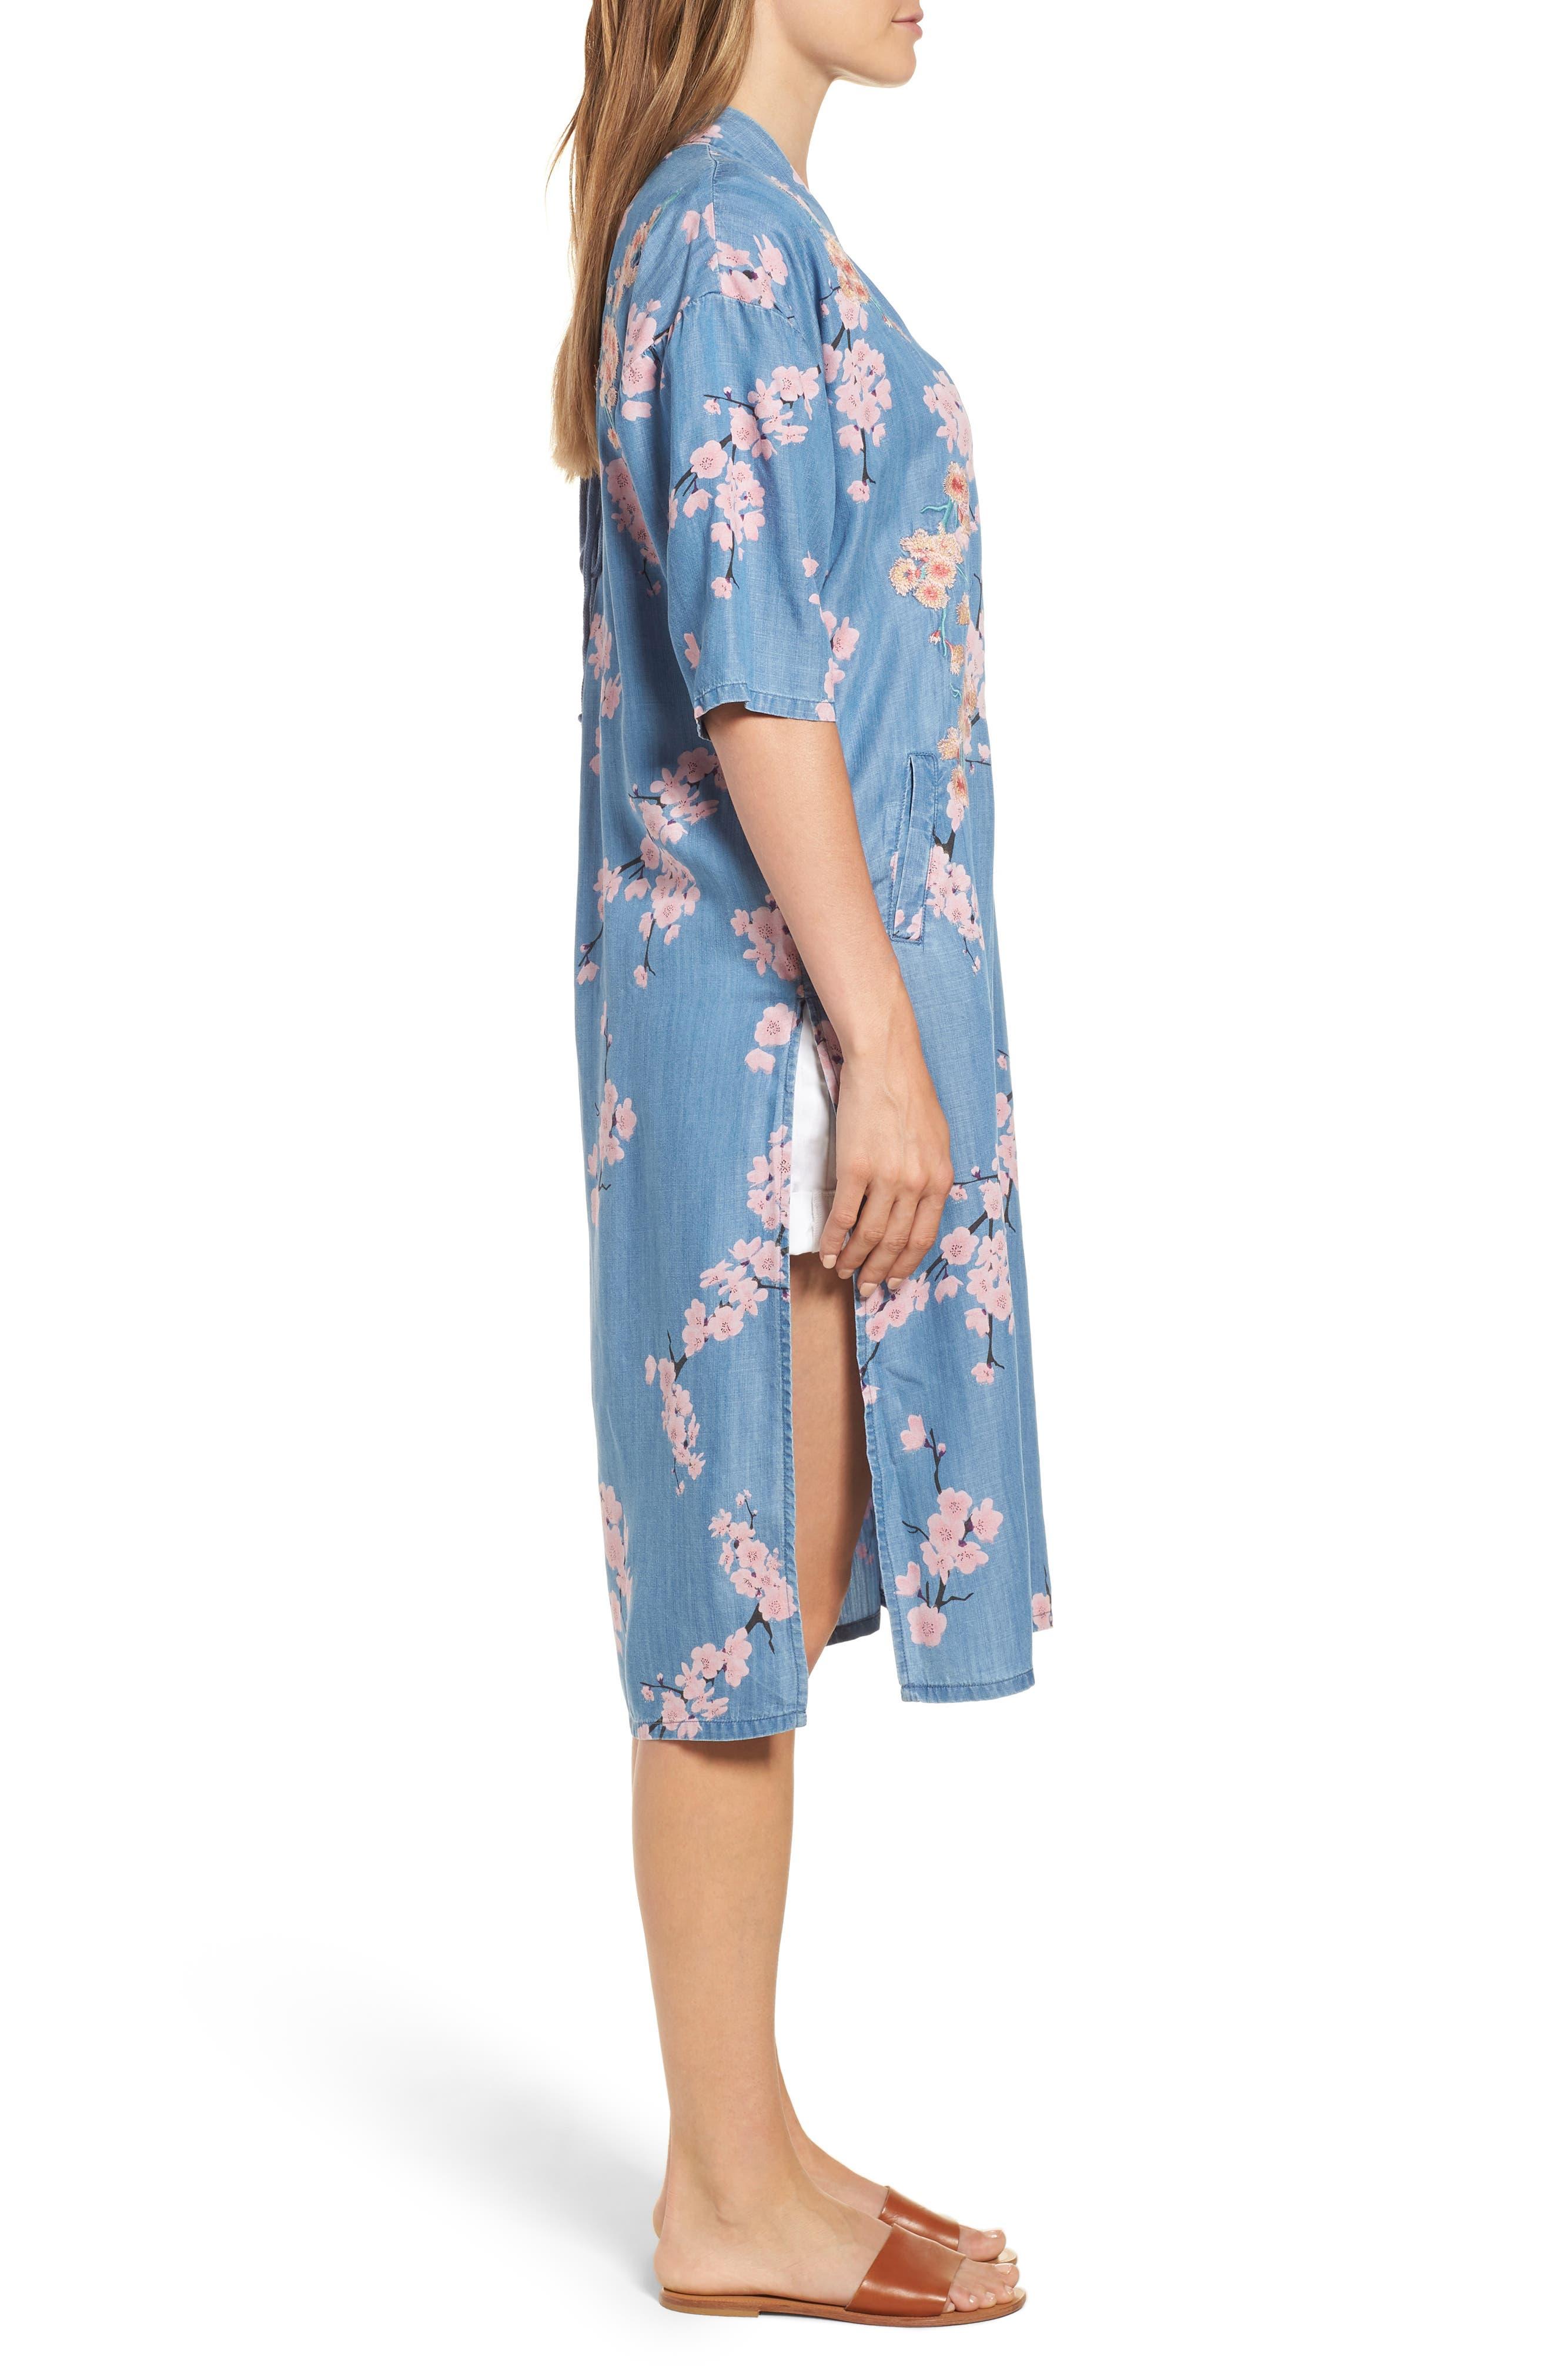 Cherry Blossom Kimono,                             Alternate thumbnail 3, color,                             Blue Cherry Blossom